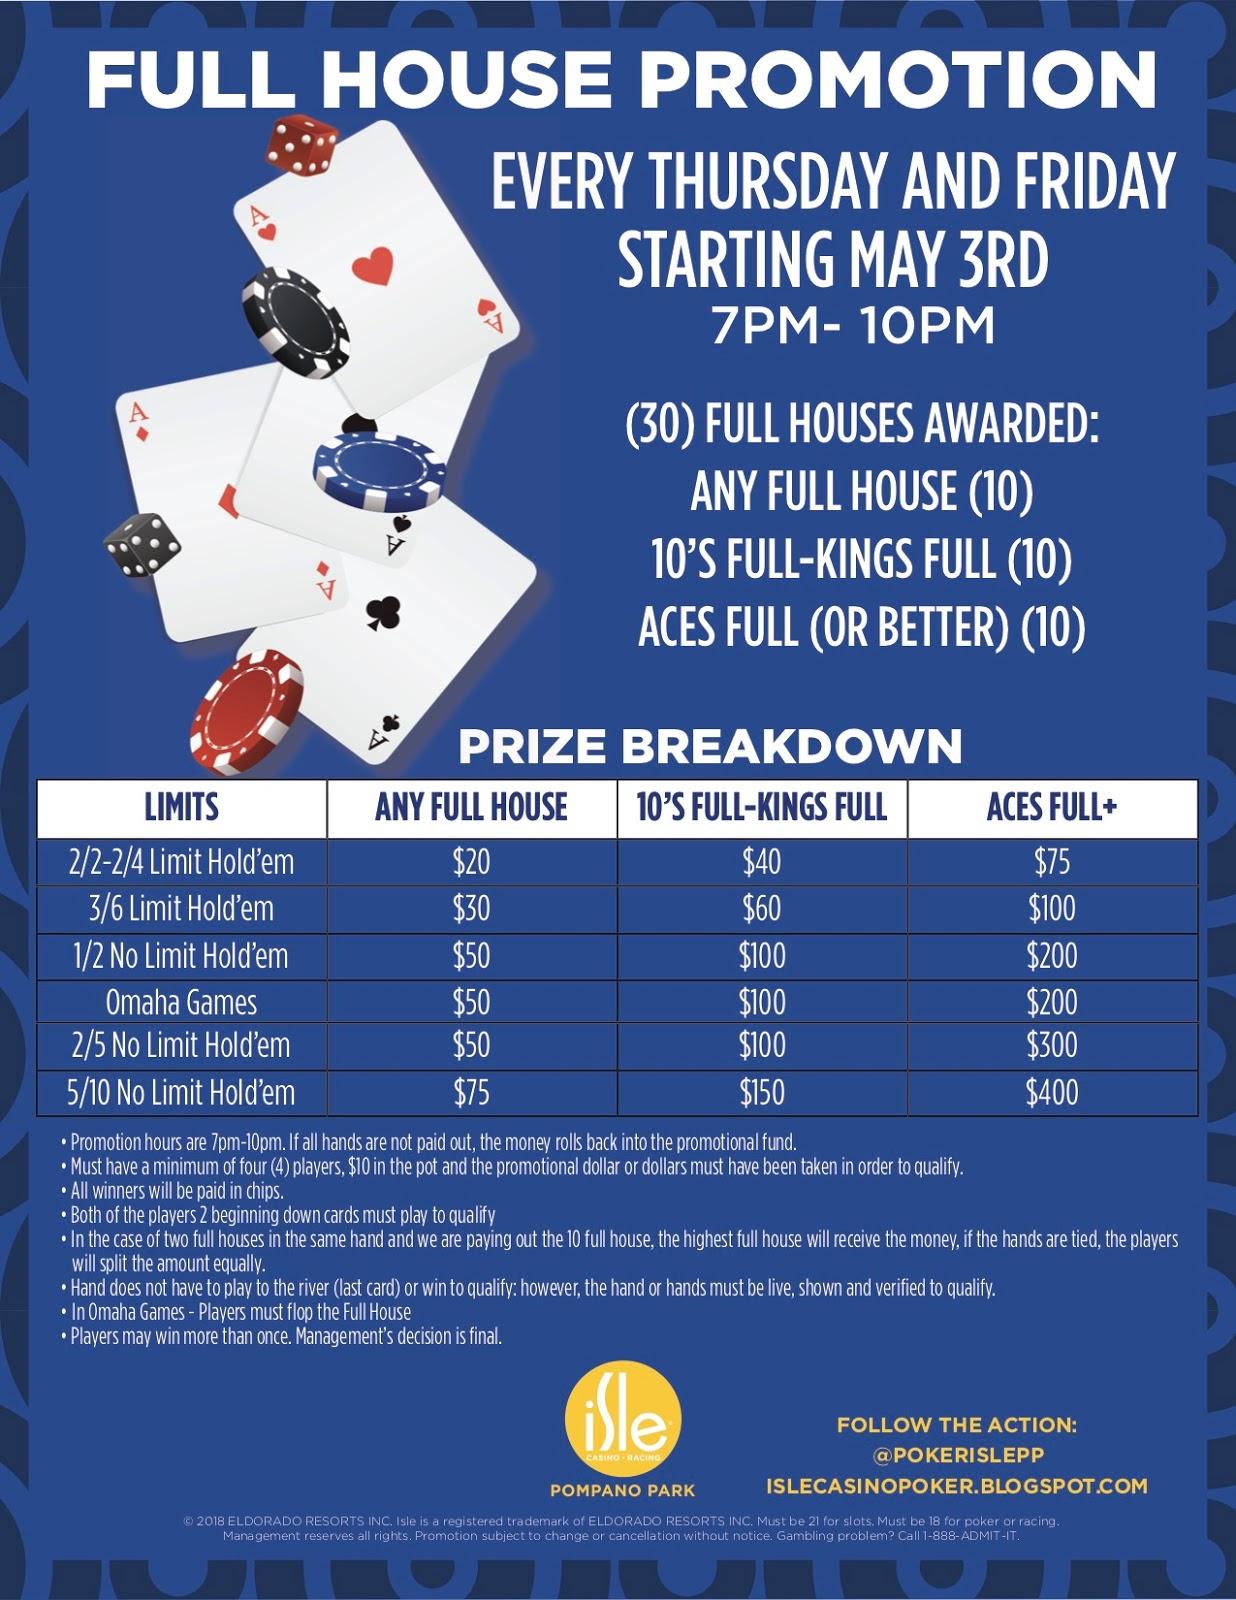 Isle Casino Poker Promotions